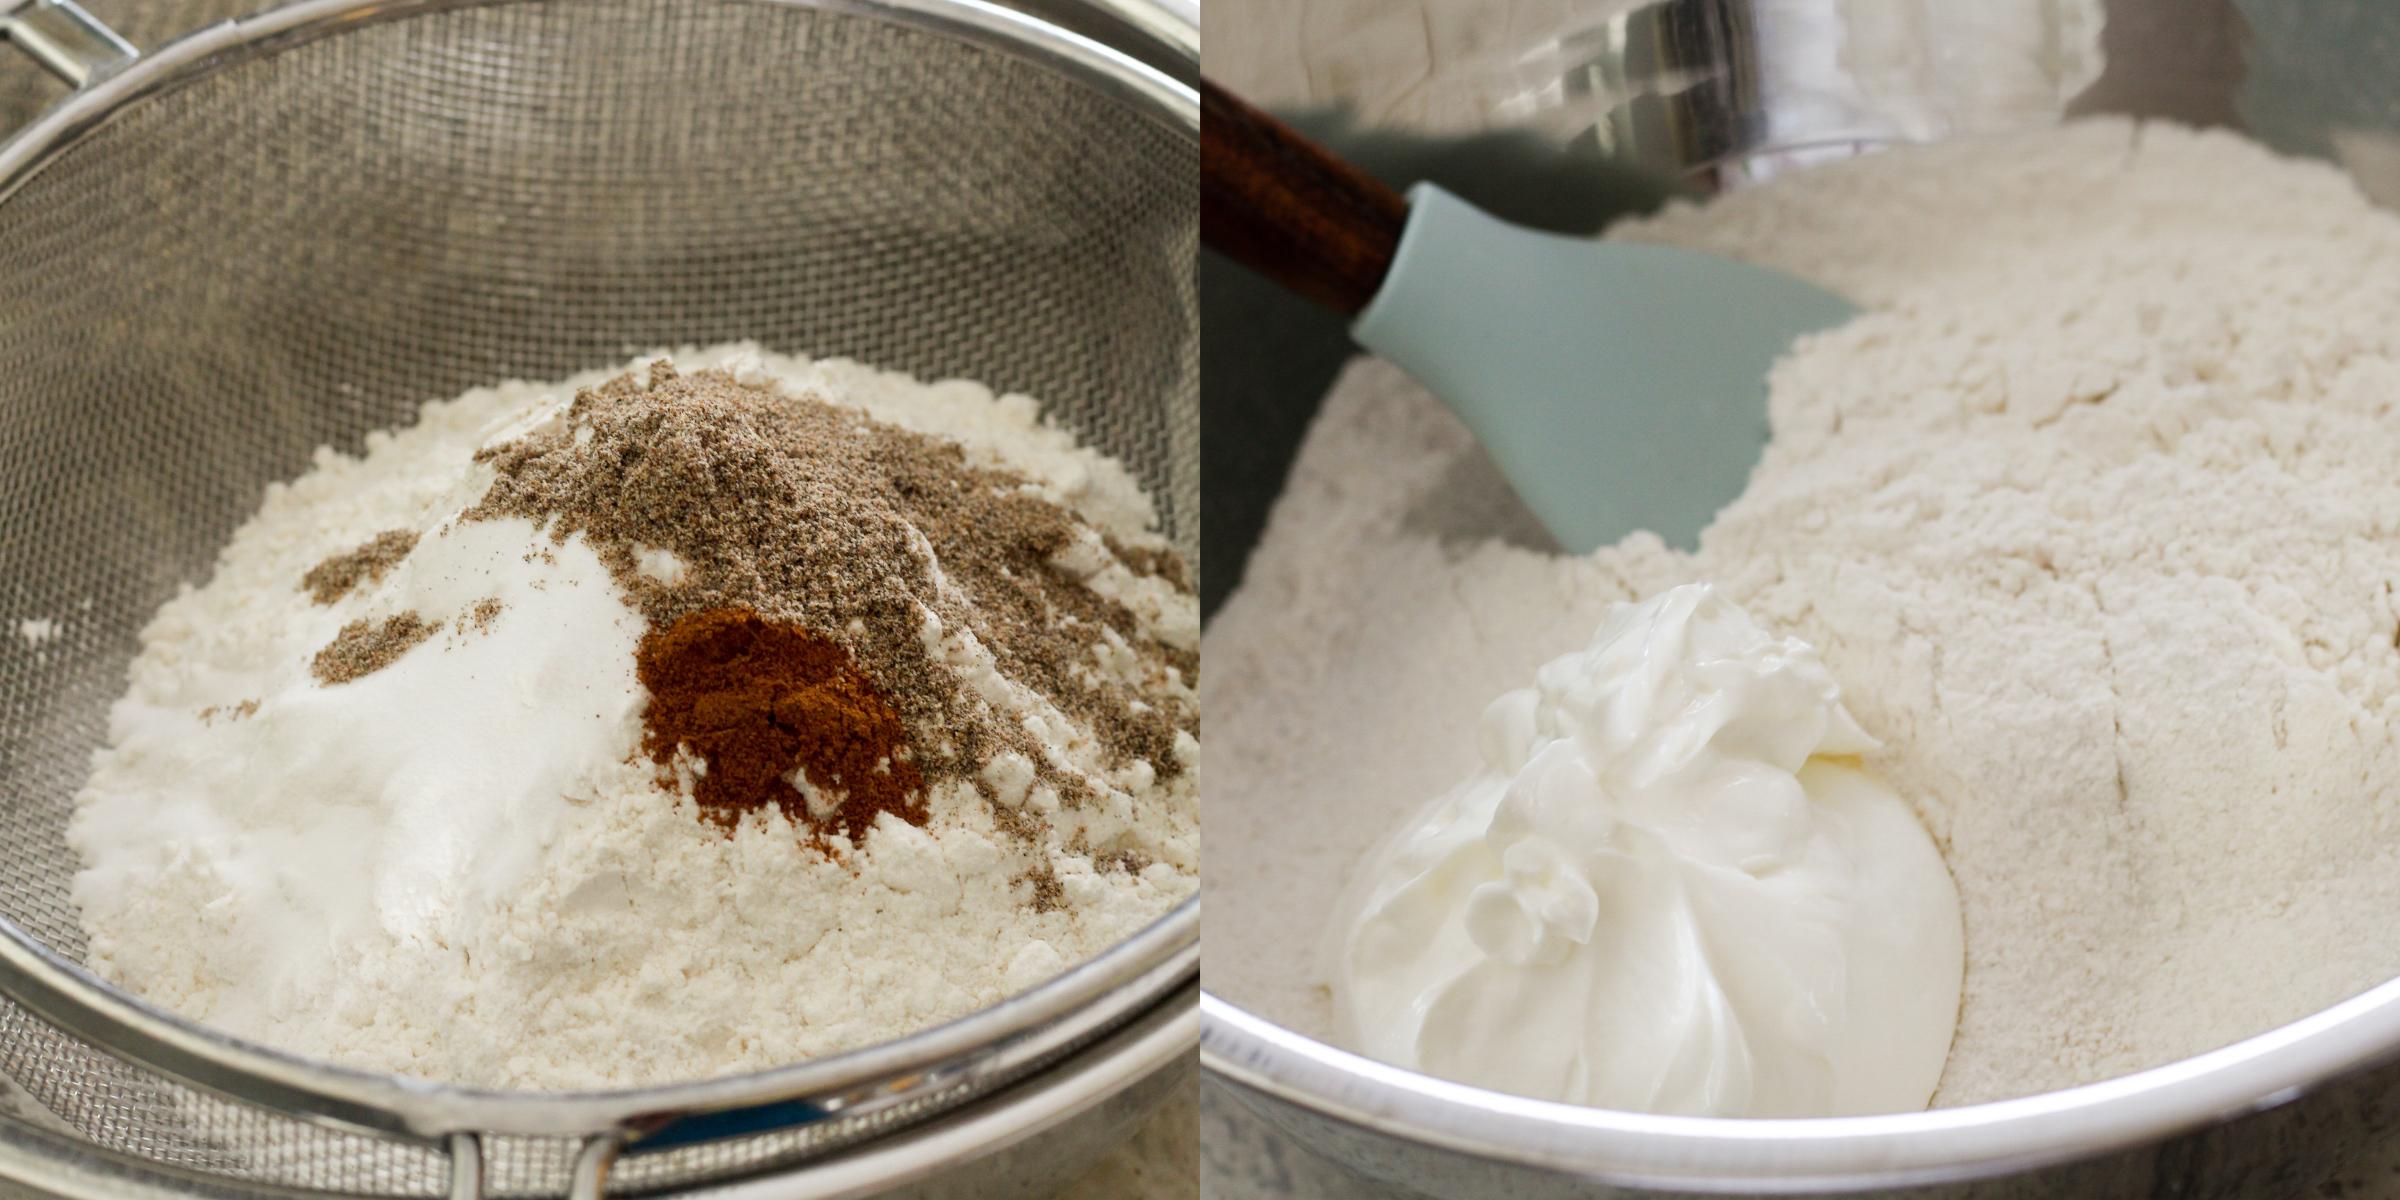 Chocolate Cardamom Sour Cream Cake